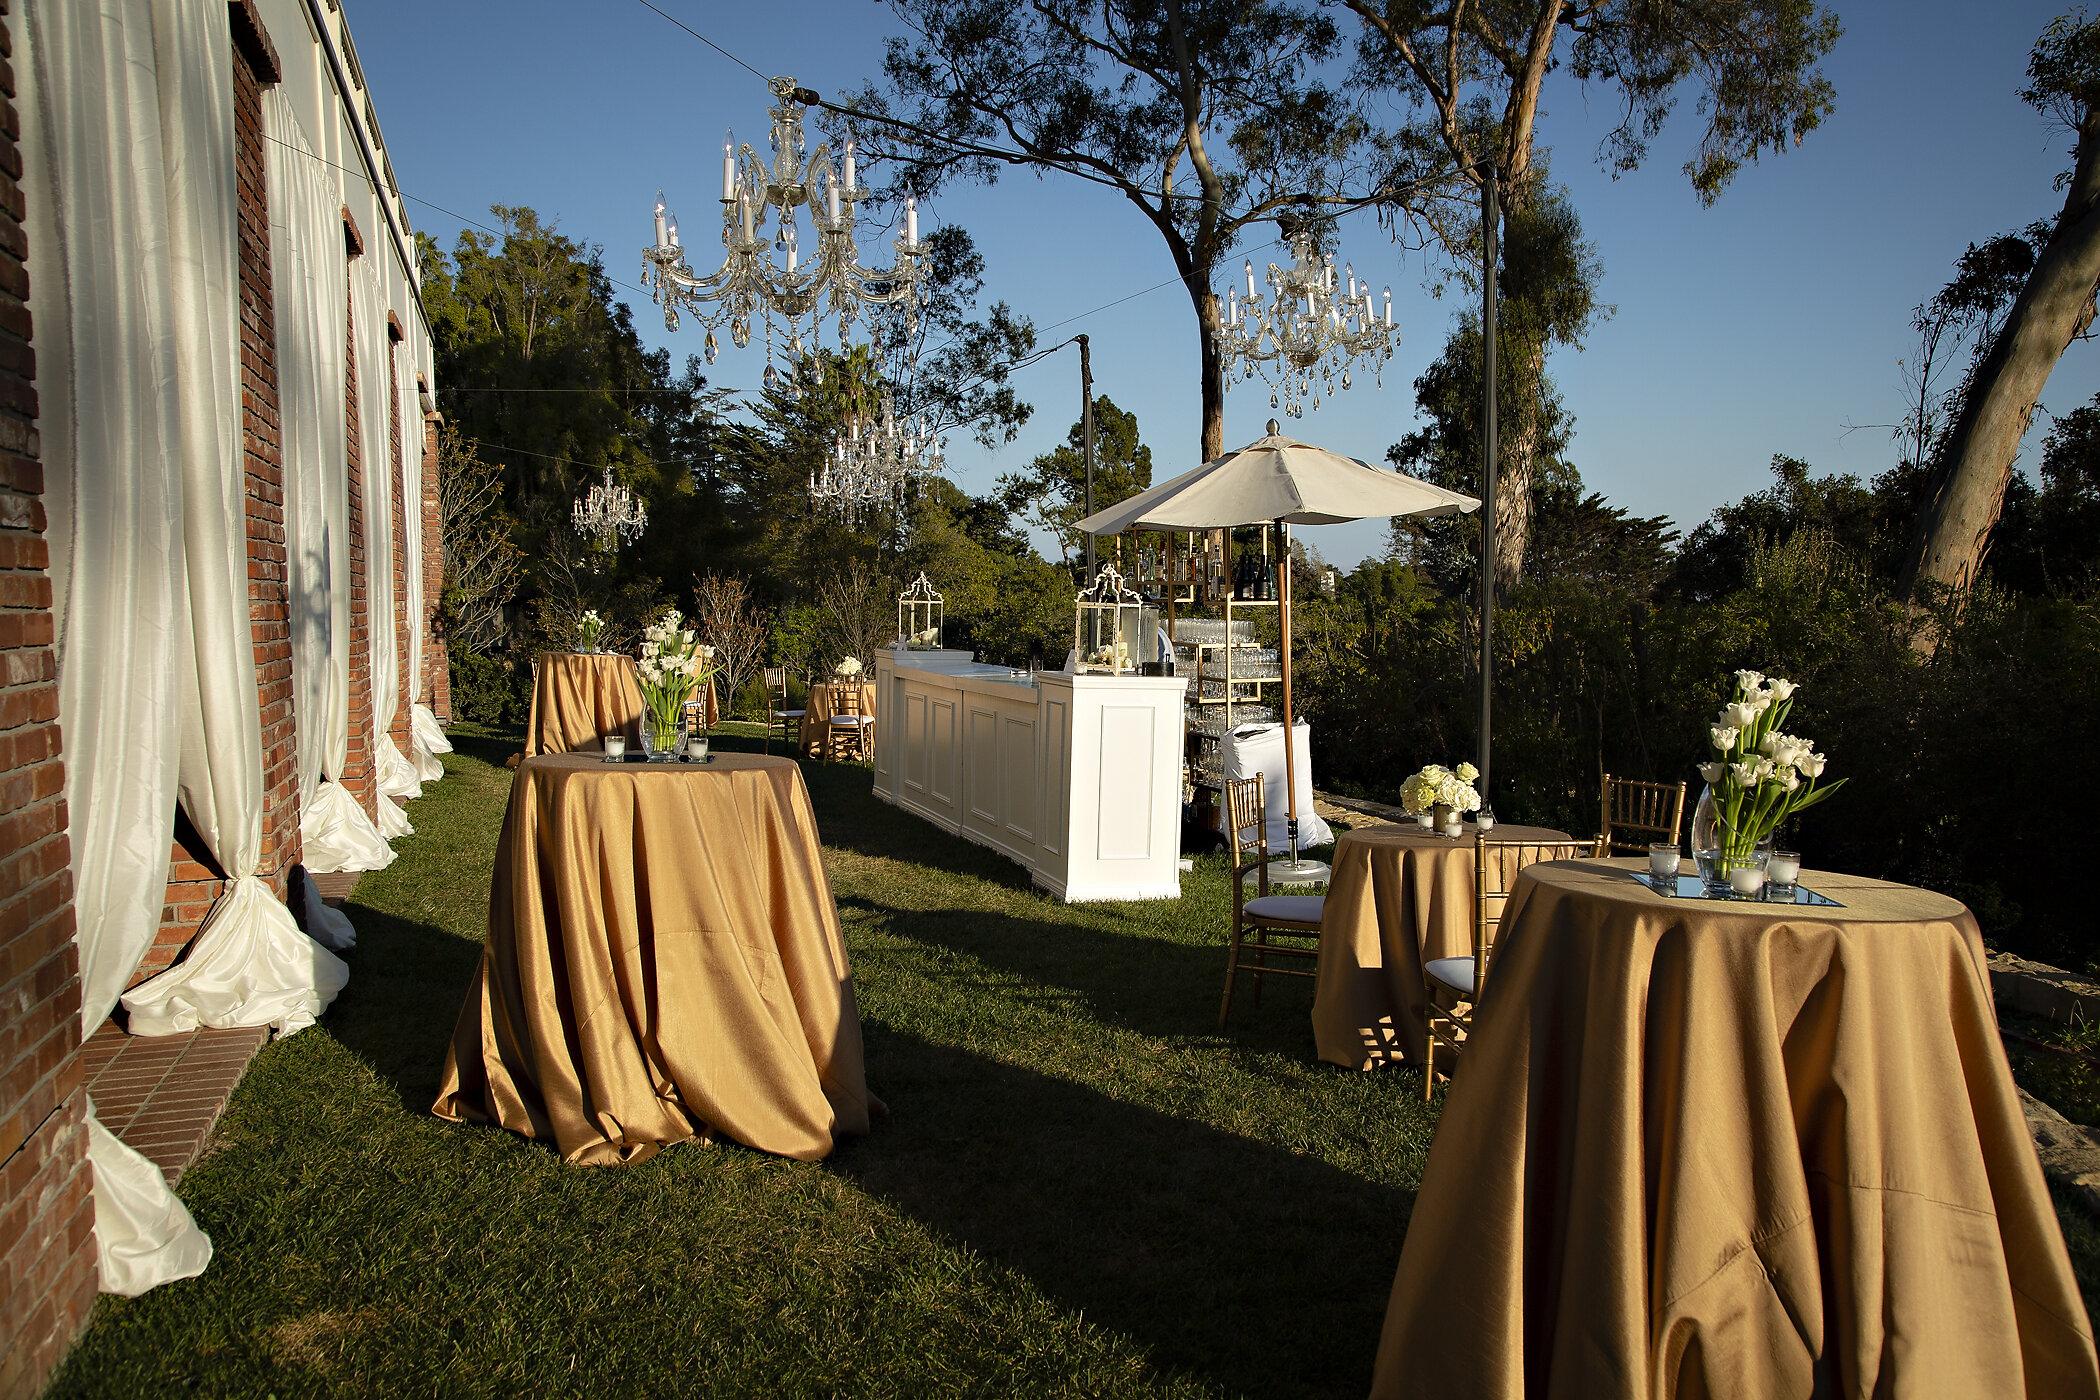 alegria-by-design-wedding-planner-planning-event-design-coordinator-day-of-belmond-el-encanto-lily-pond-garden-ceremony-formal-black-tie (10).jpg